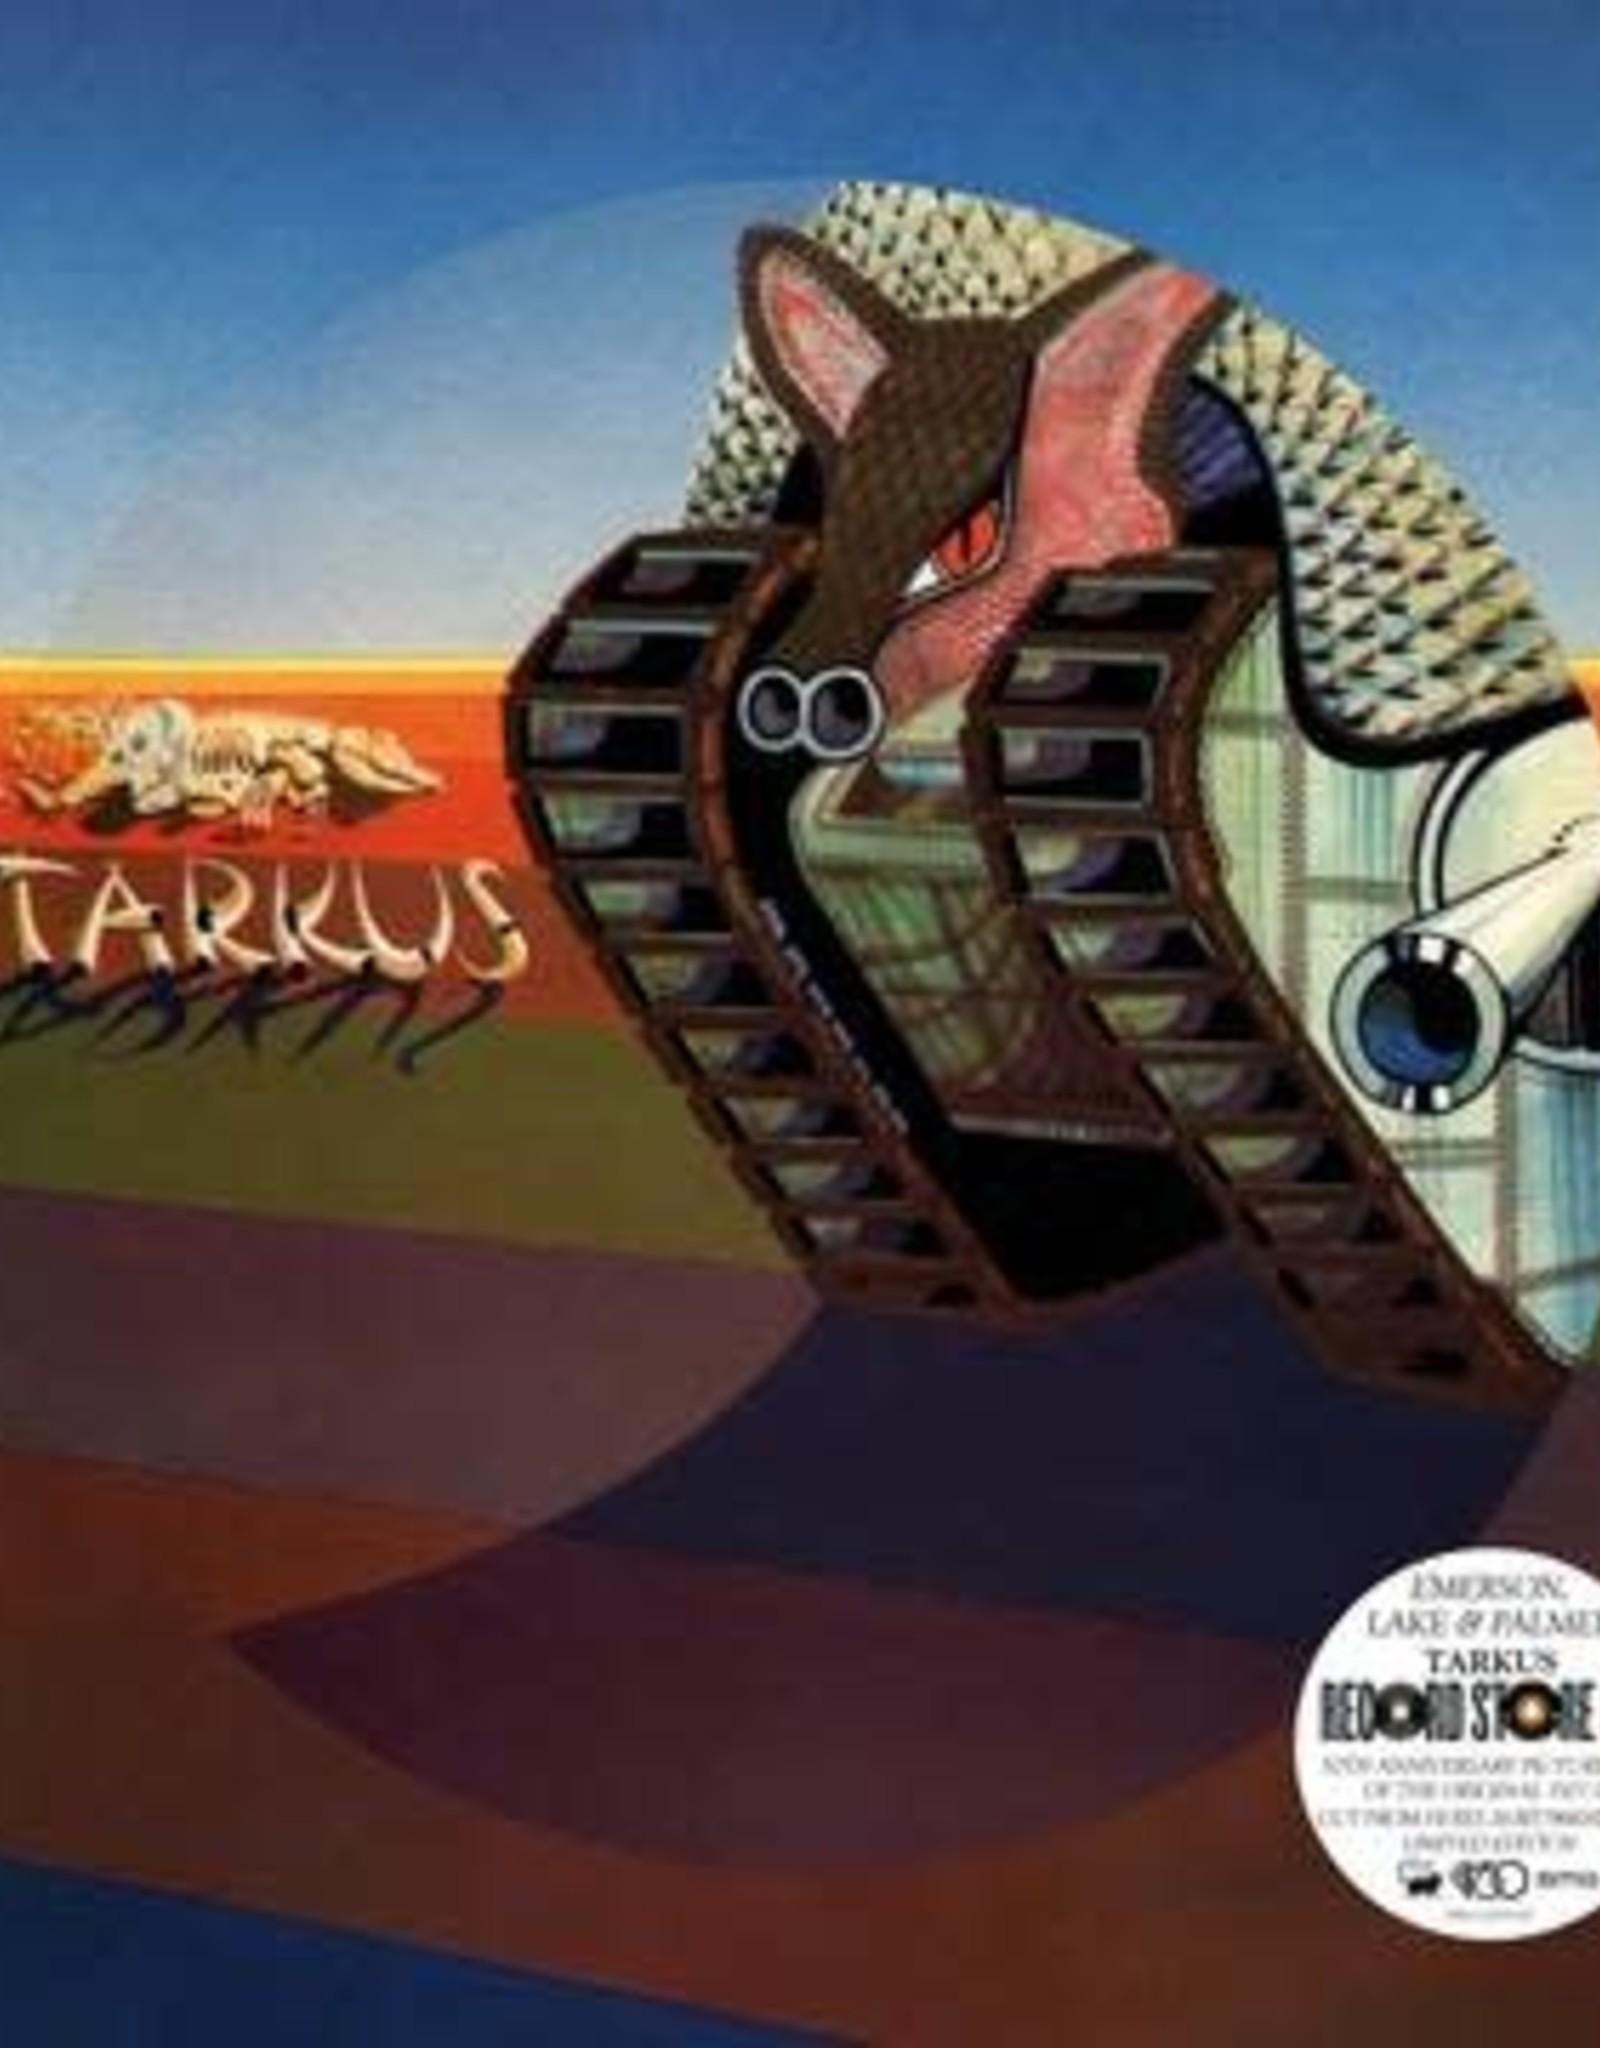 Emerson, Lake & Palmer - Tarkus (50th Anniversary/Picture Disc) (RSD 6/21)